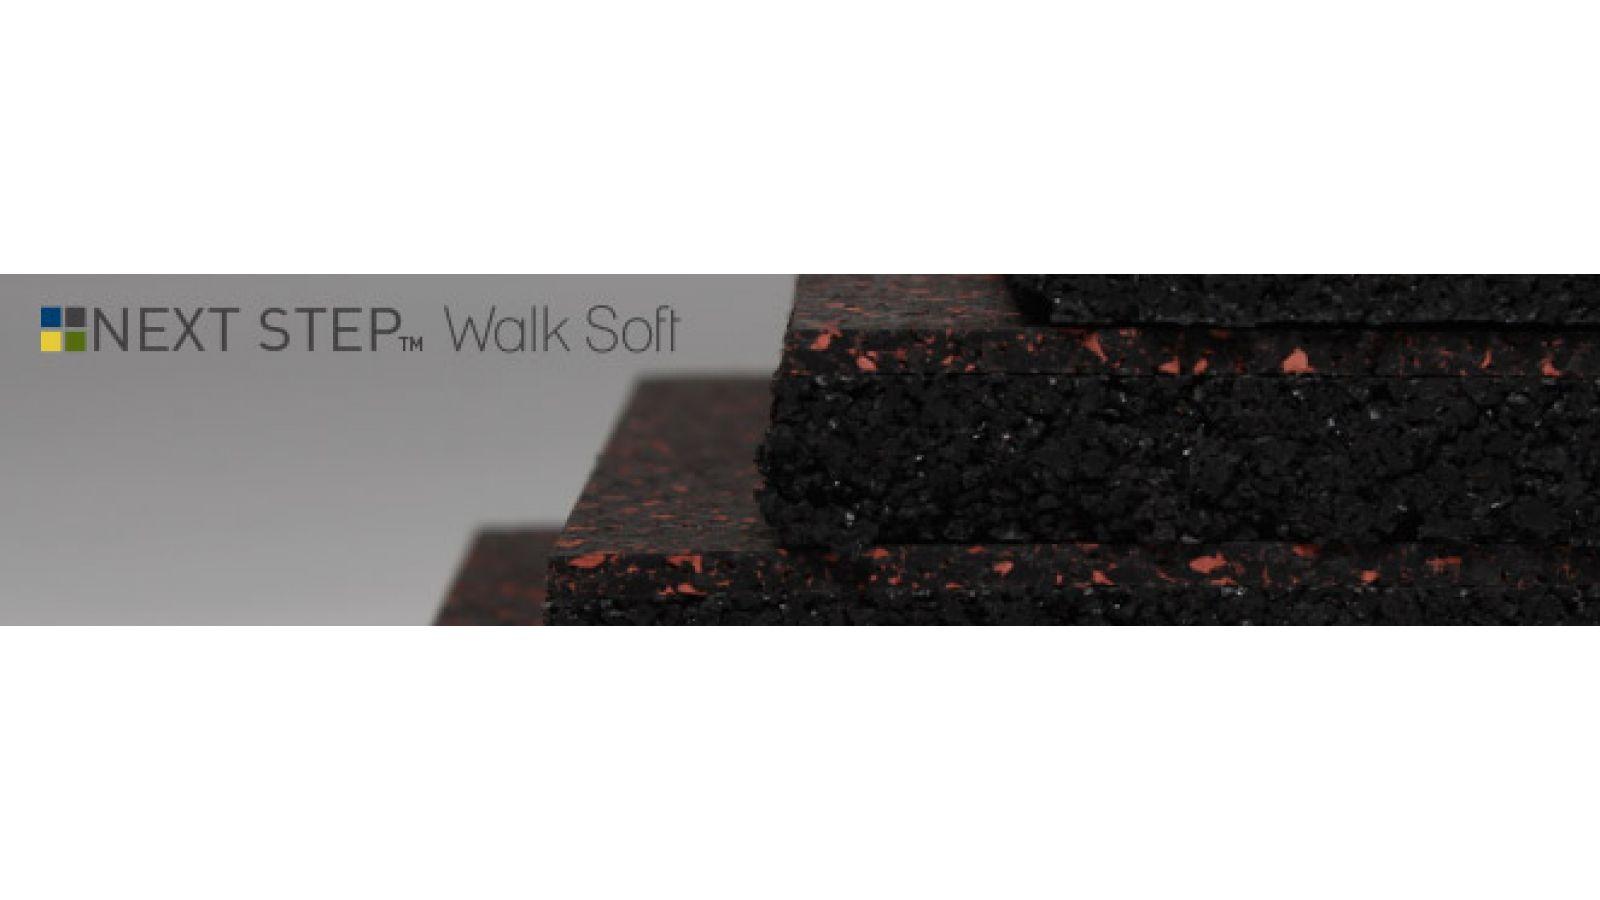 NEXT STEP Walk Soft